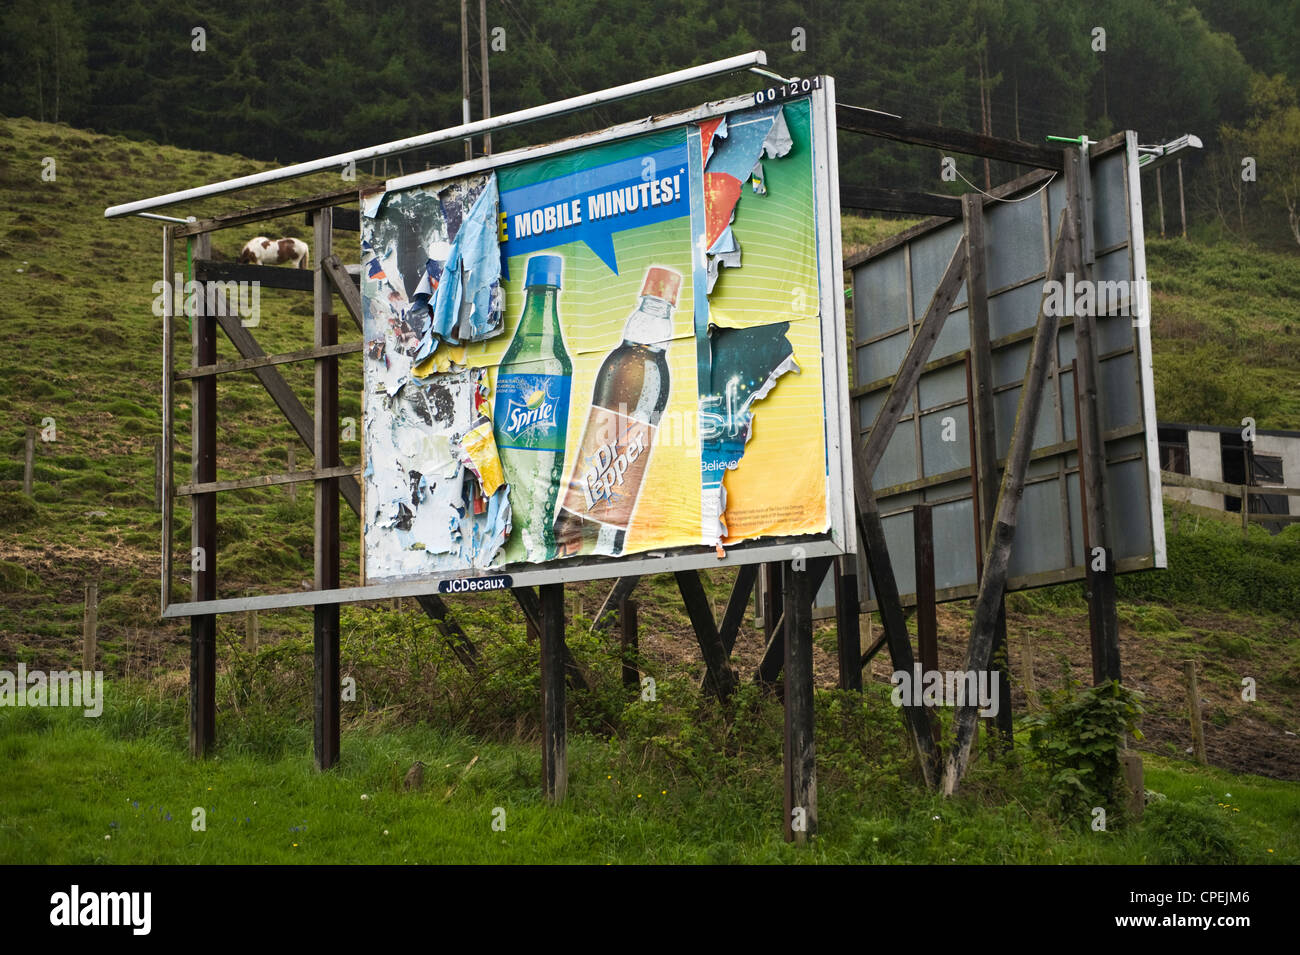 Derelict JCDecaux billboard advertising site on roadside near Merthyr Tydfil South Wales UK - Stock Image